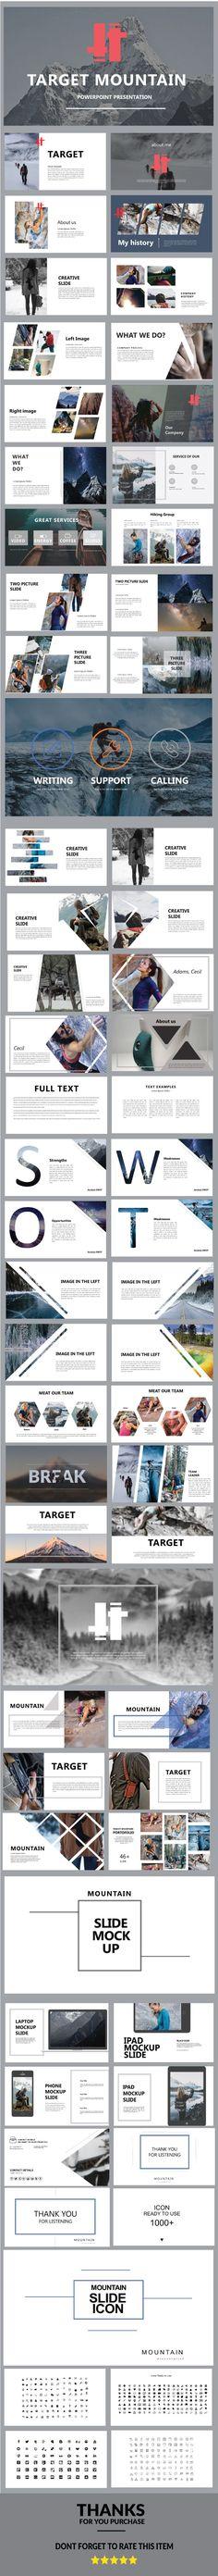 Target Mountain - PowerPoint Presentation Template